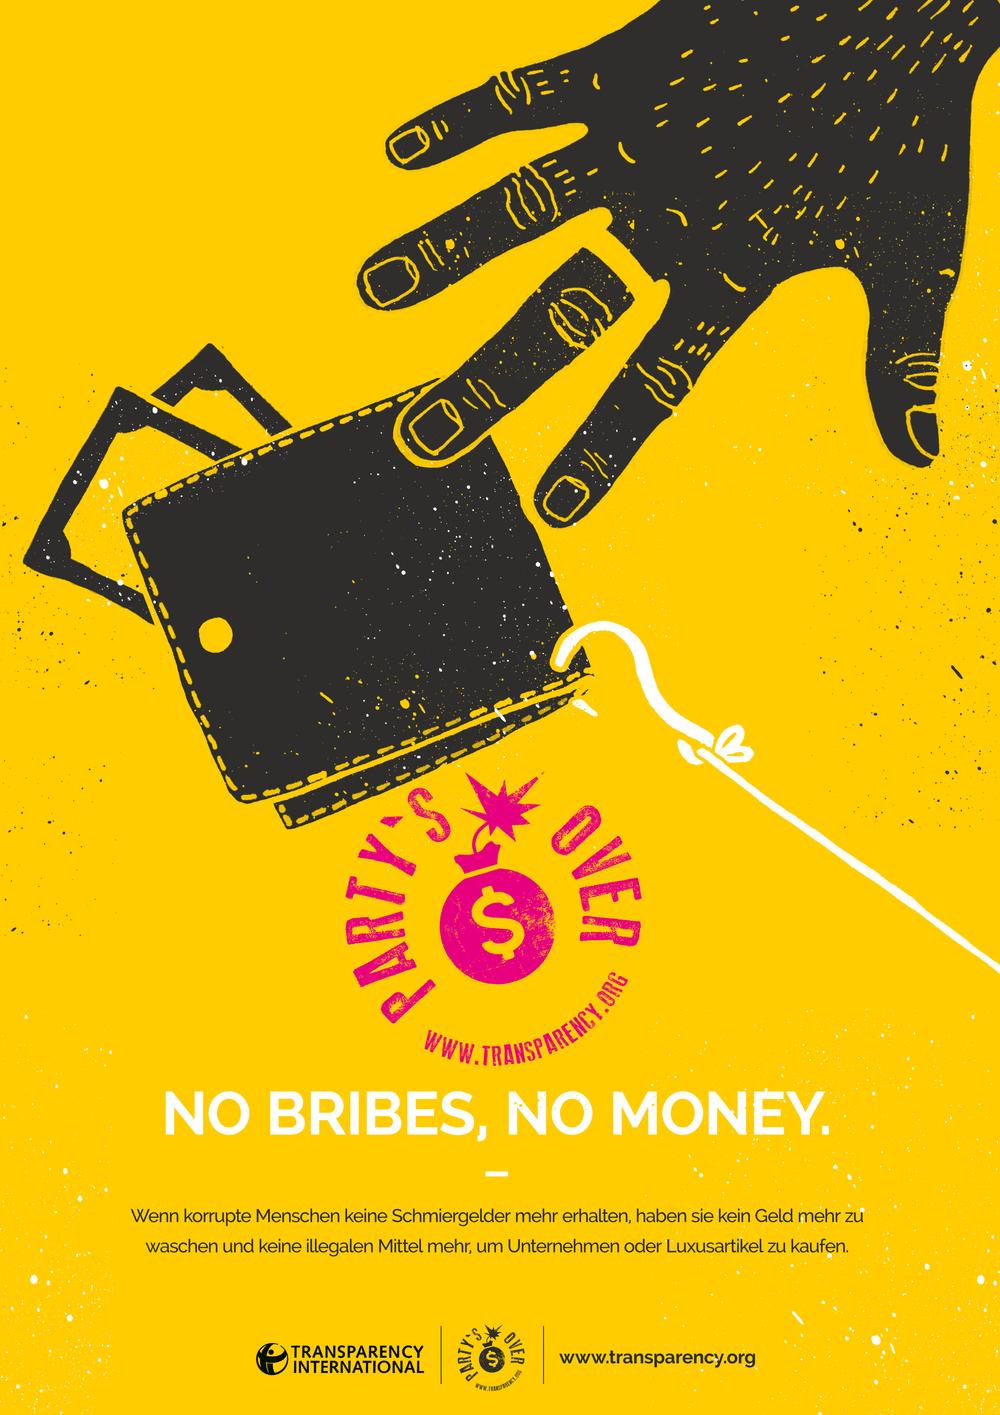 Transparency international poster009a bigger